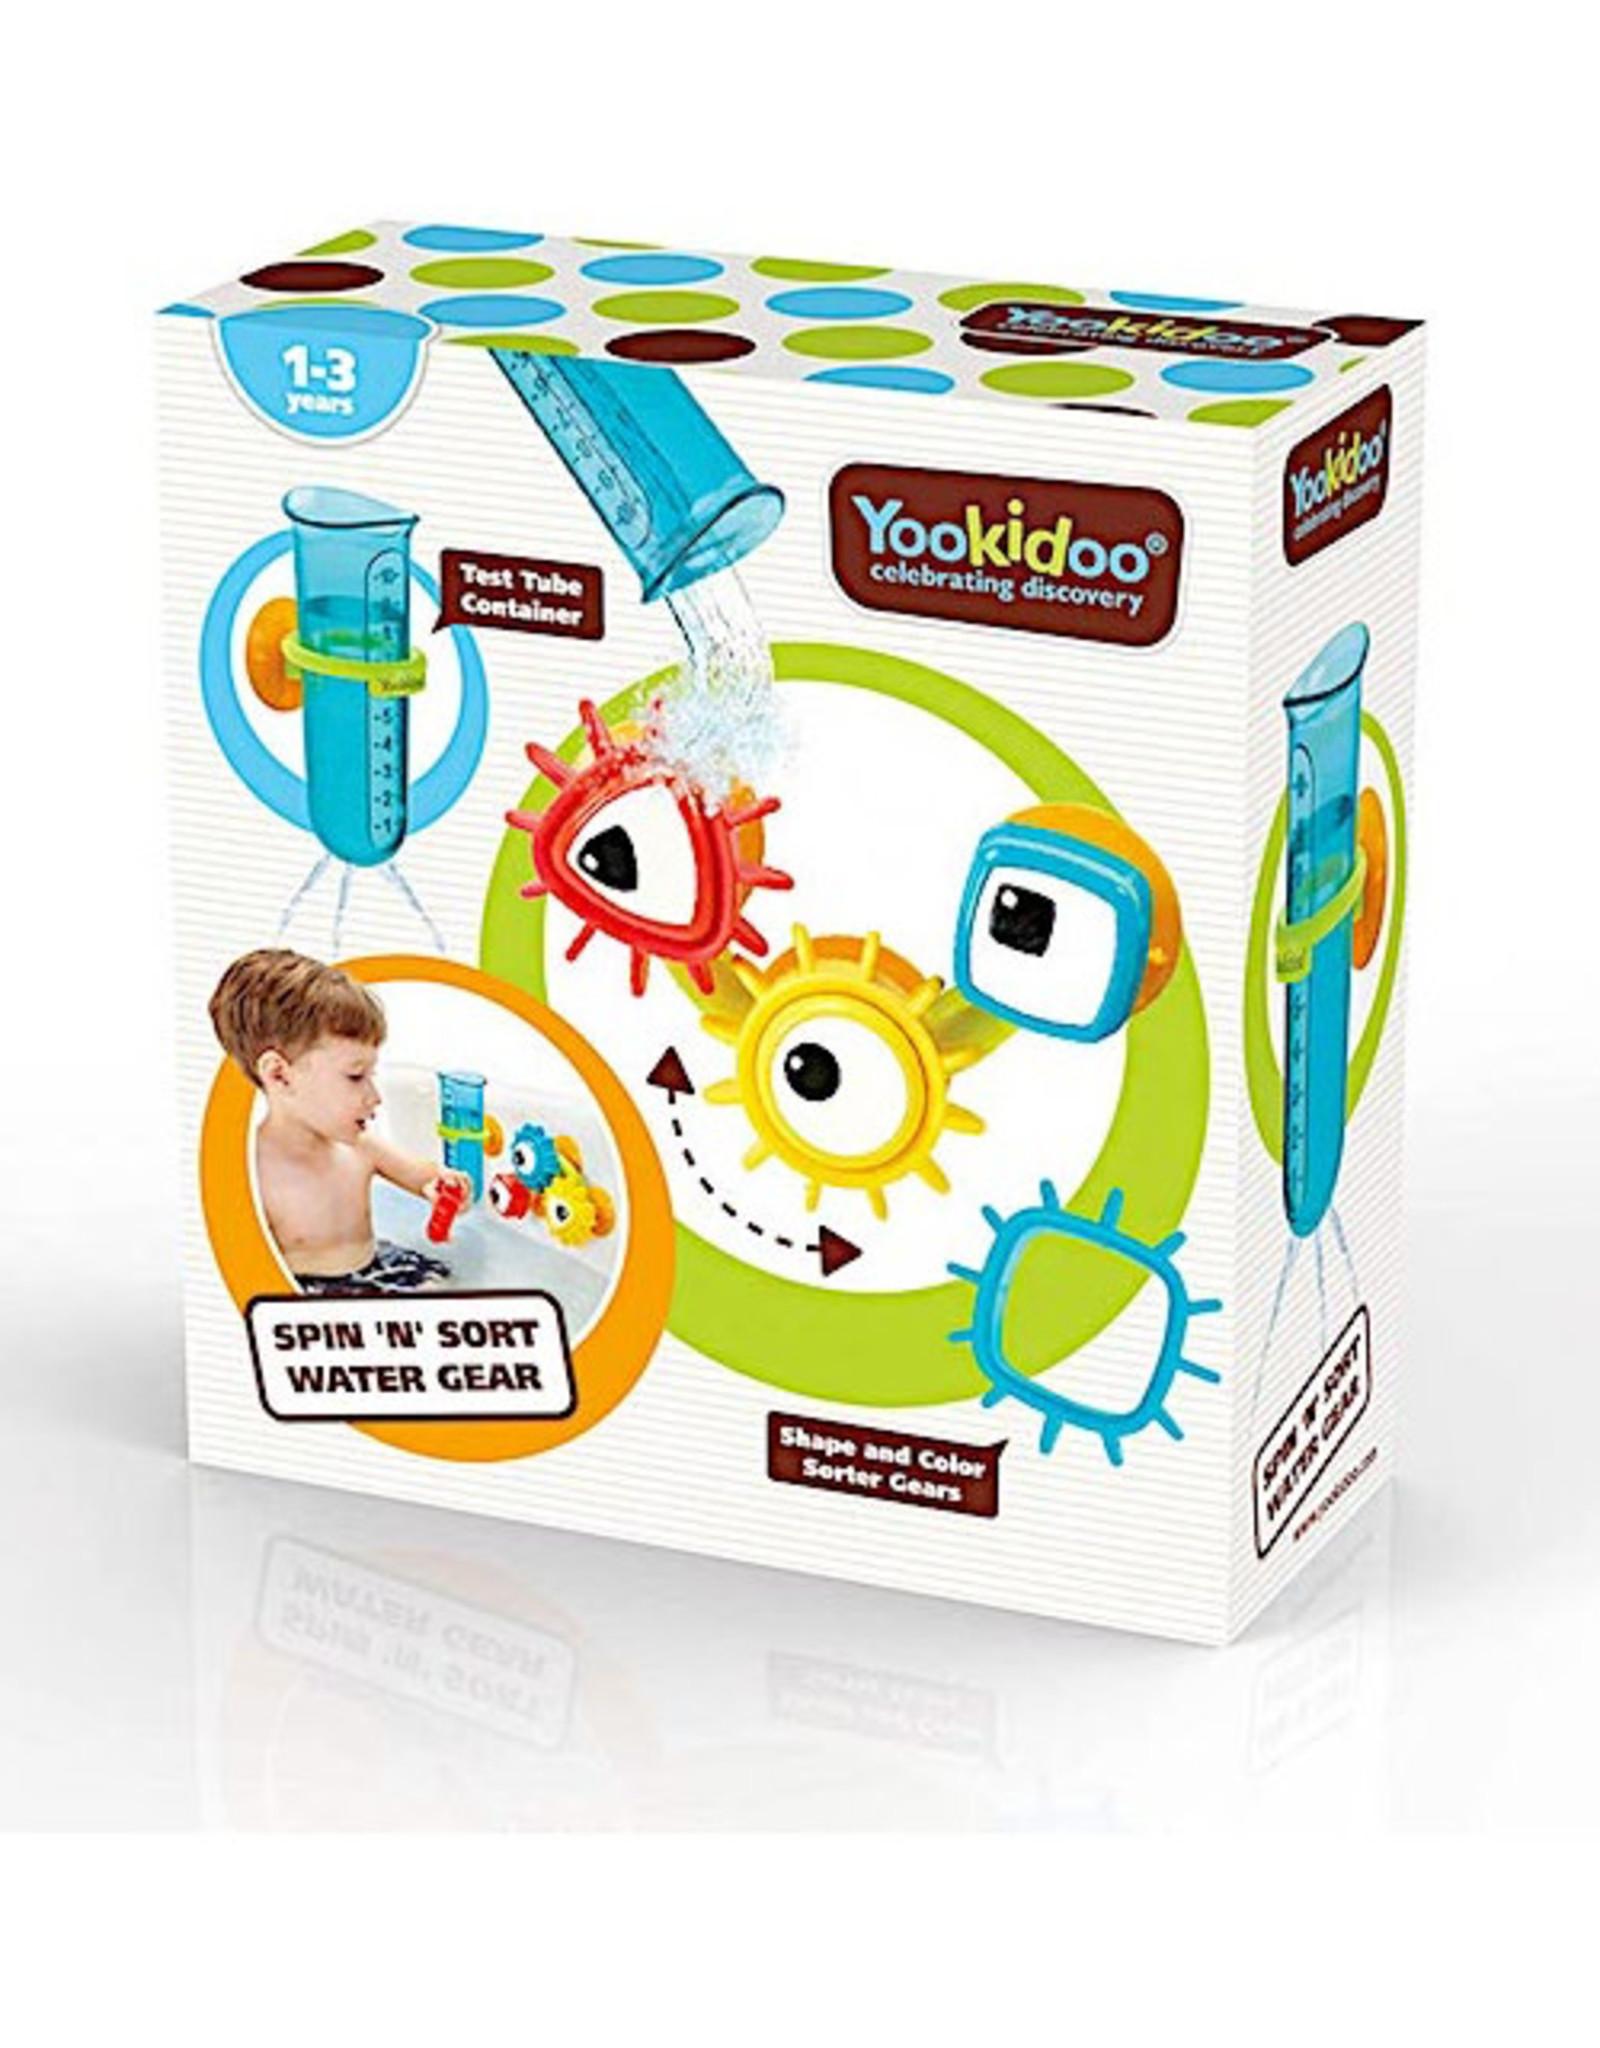 Yookidoo Spin N Sort Water Gear